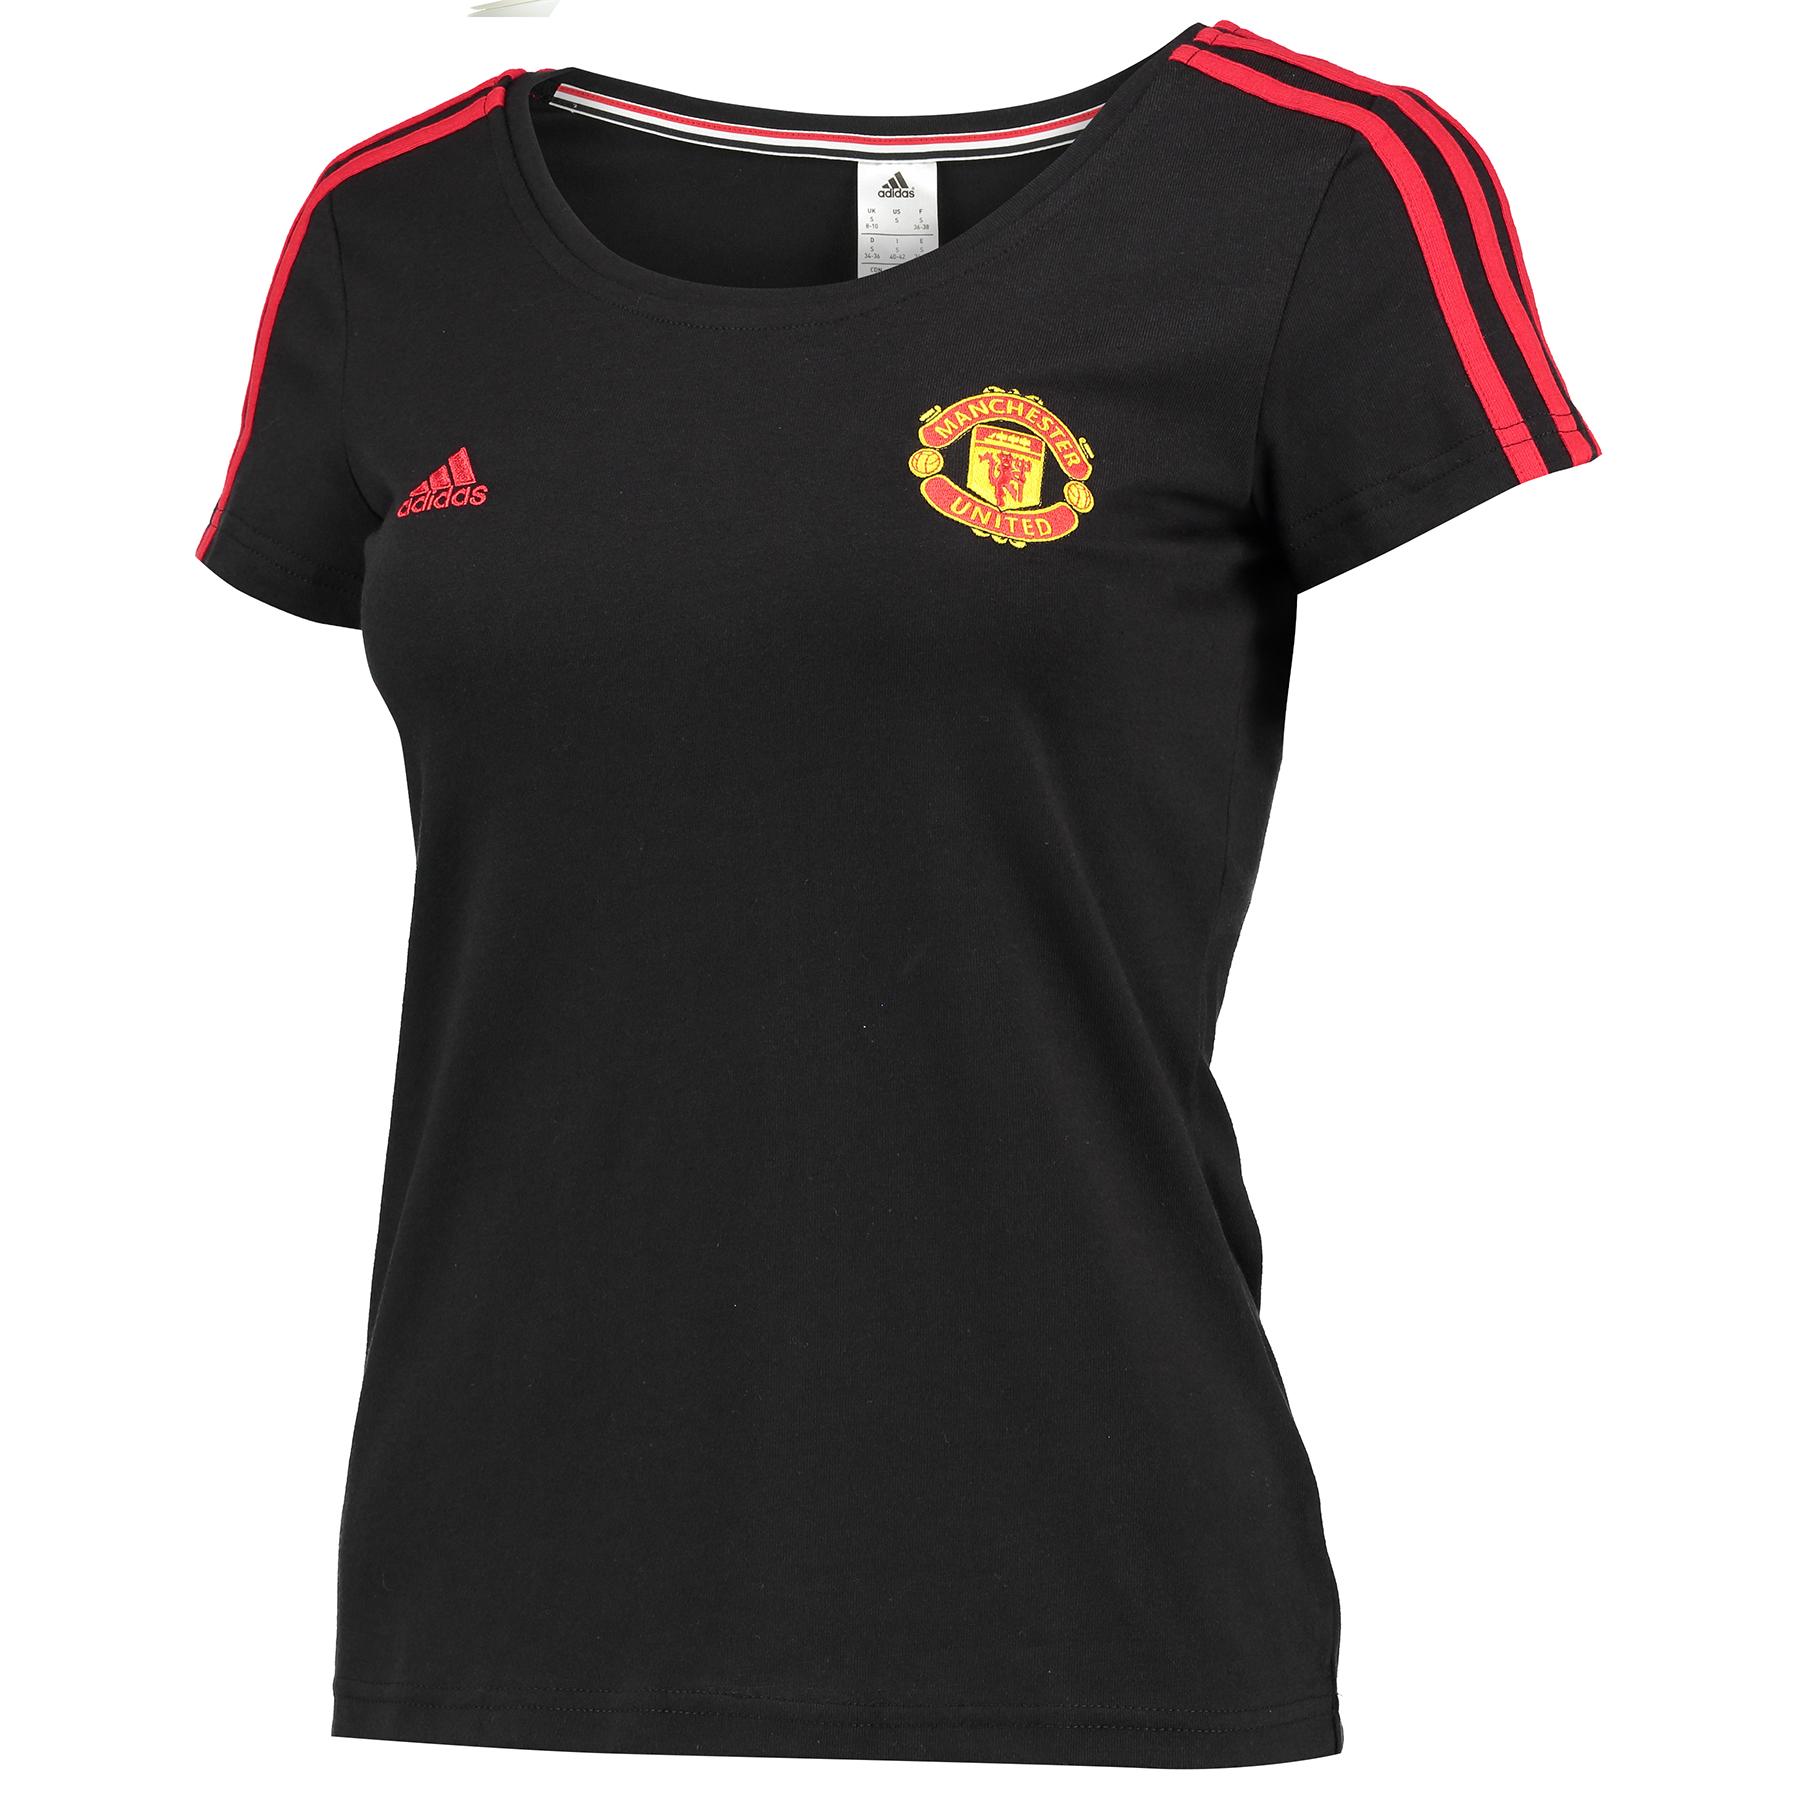 Manchester United Core T-Shirt - Womens Black